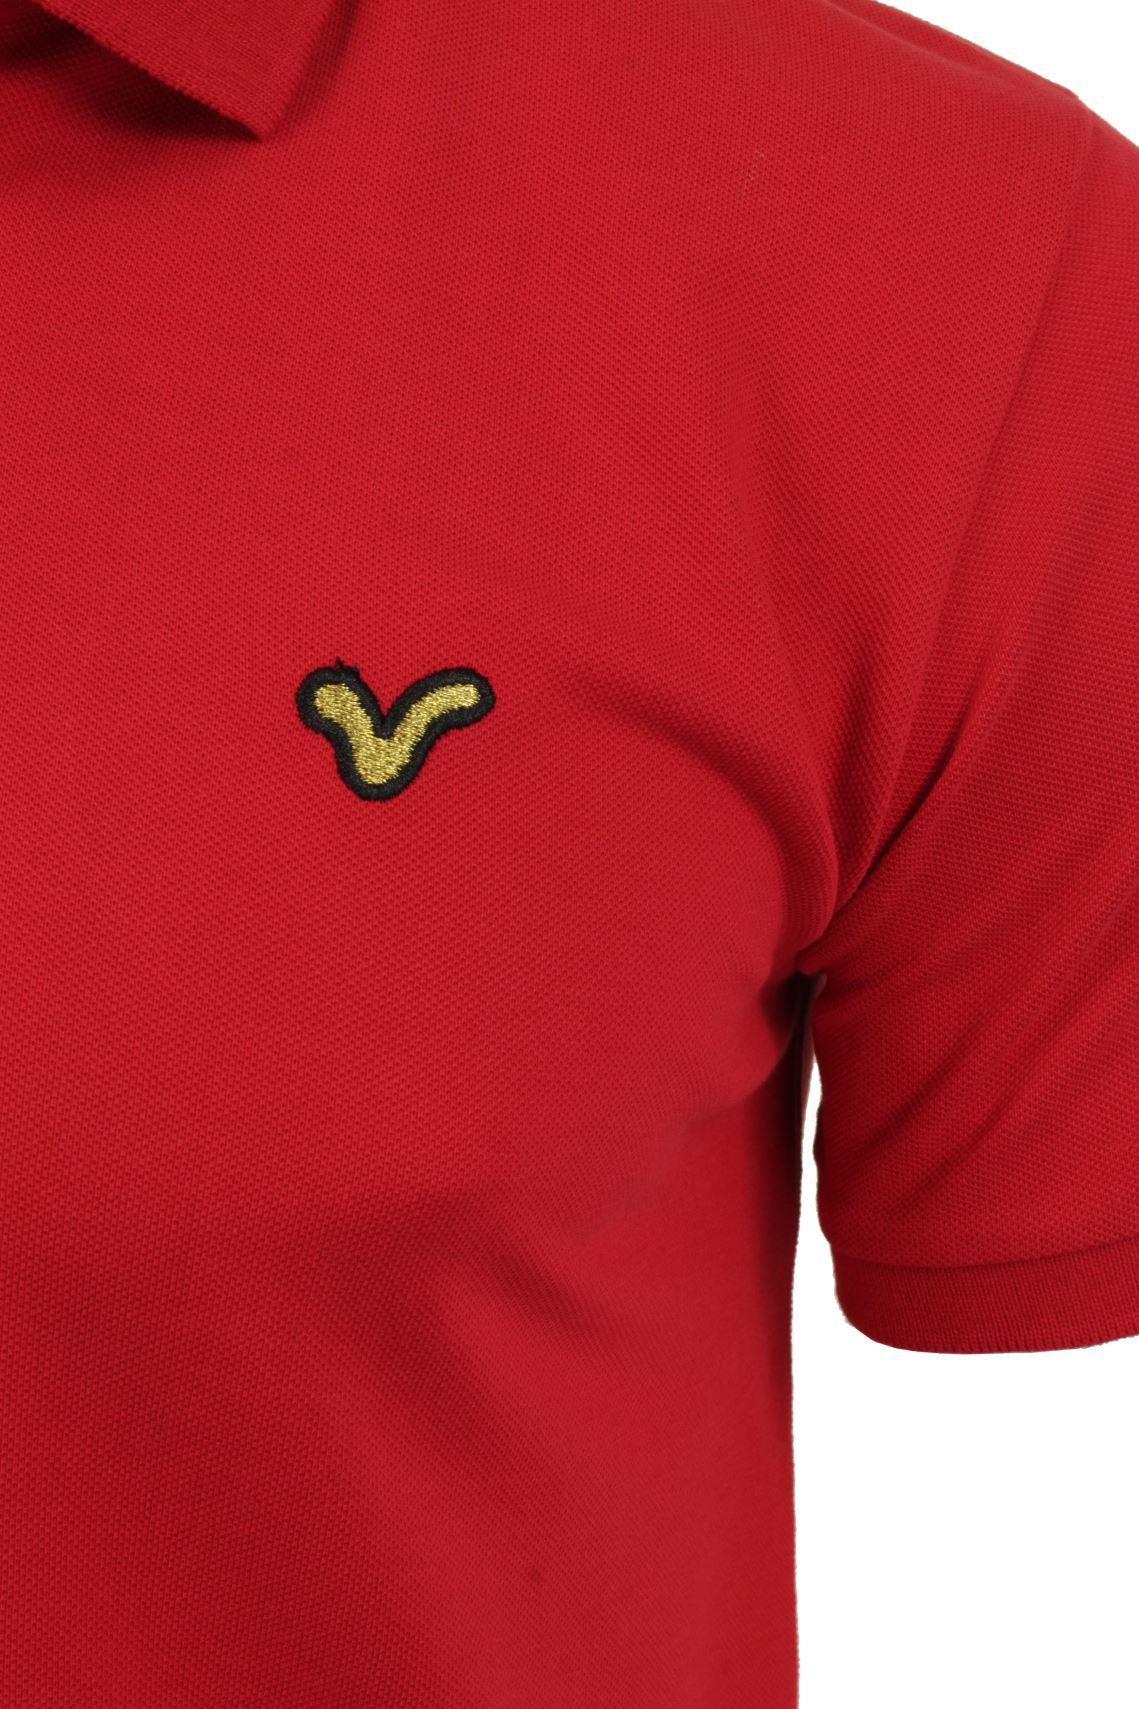 Camisa-Polo-para-hombre-Voi-Jeans-Redford-de-manga-corta-de-moda miniatura 7